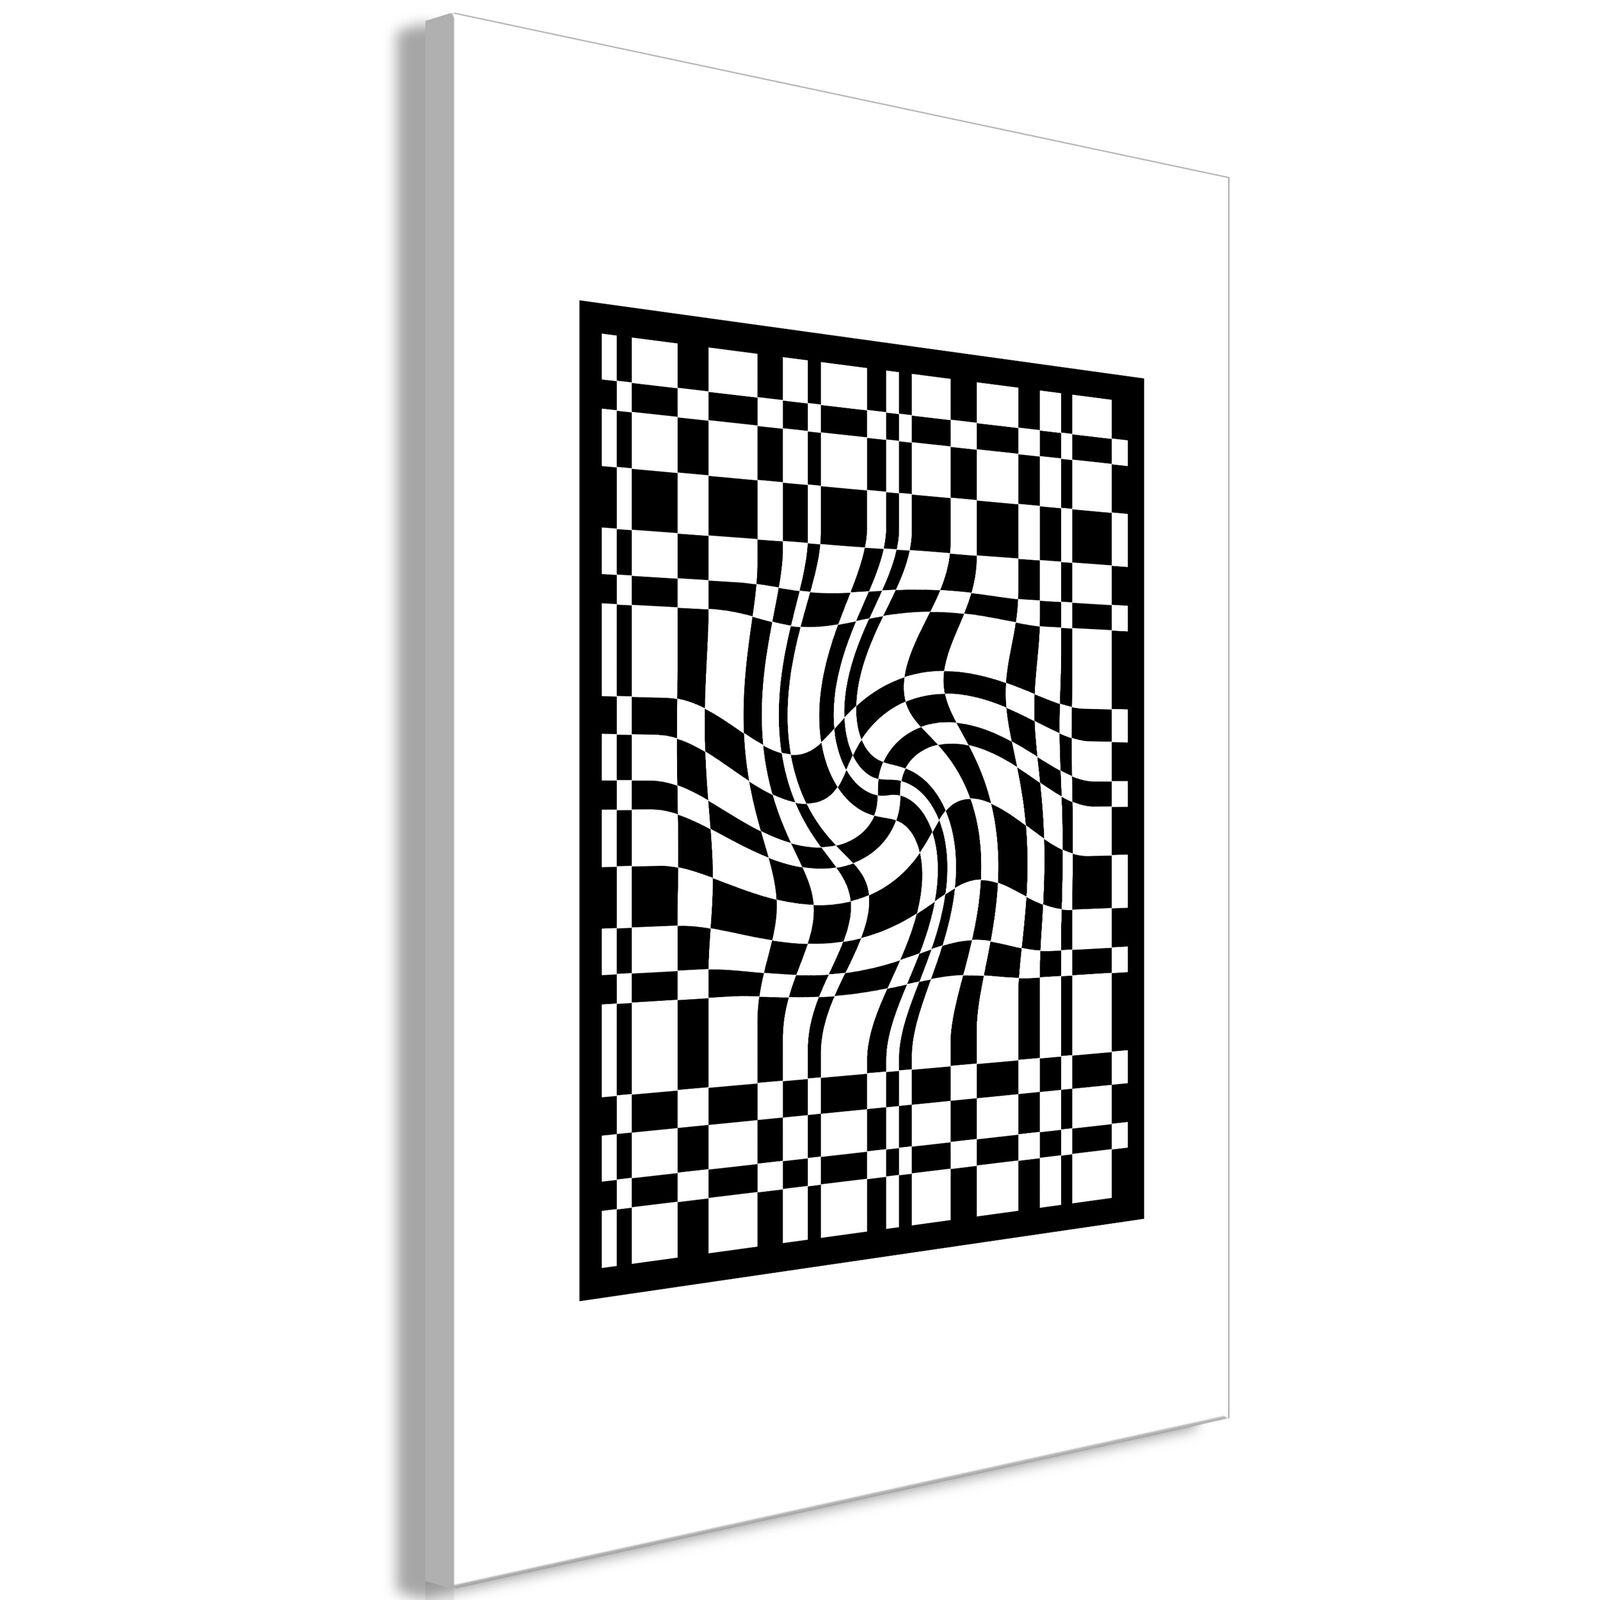 Leinwand Bilder Abstrakt 3D optik schwarz weiß Kunstdruck moderne Wandbilder XXL